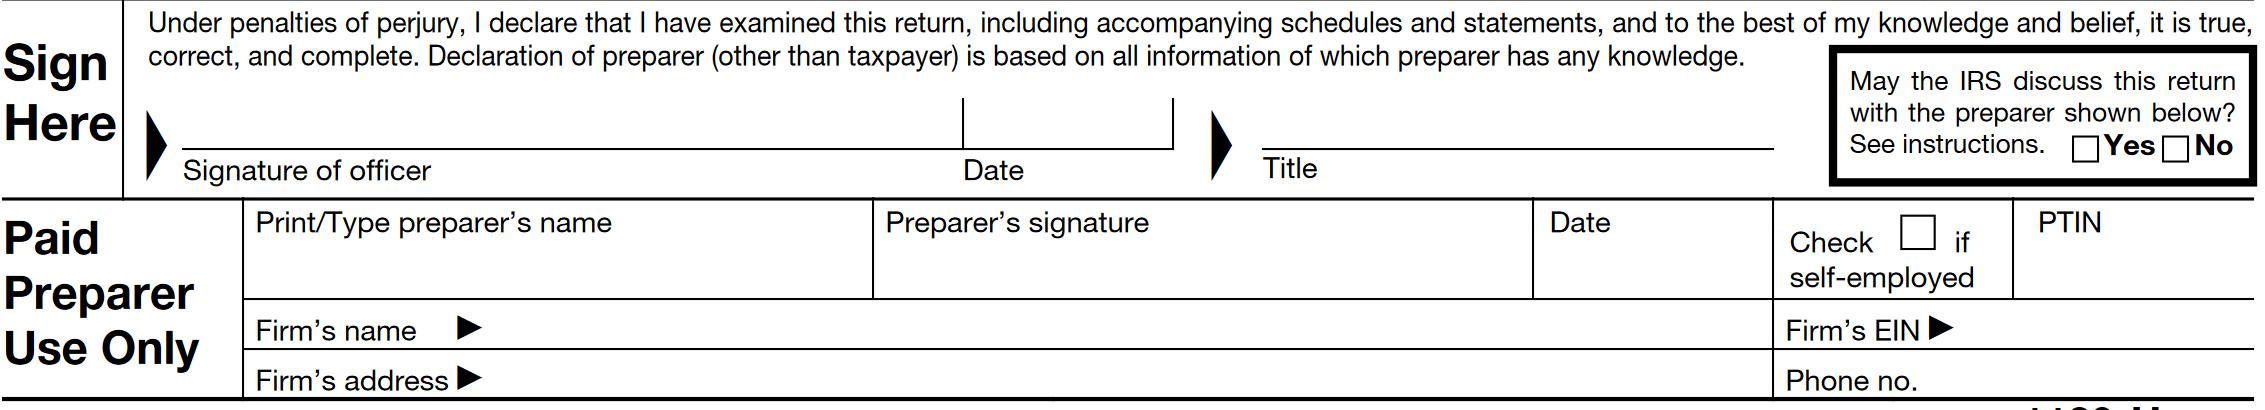 Condo Association Tax Return filing help